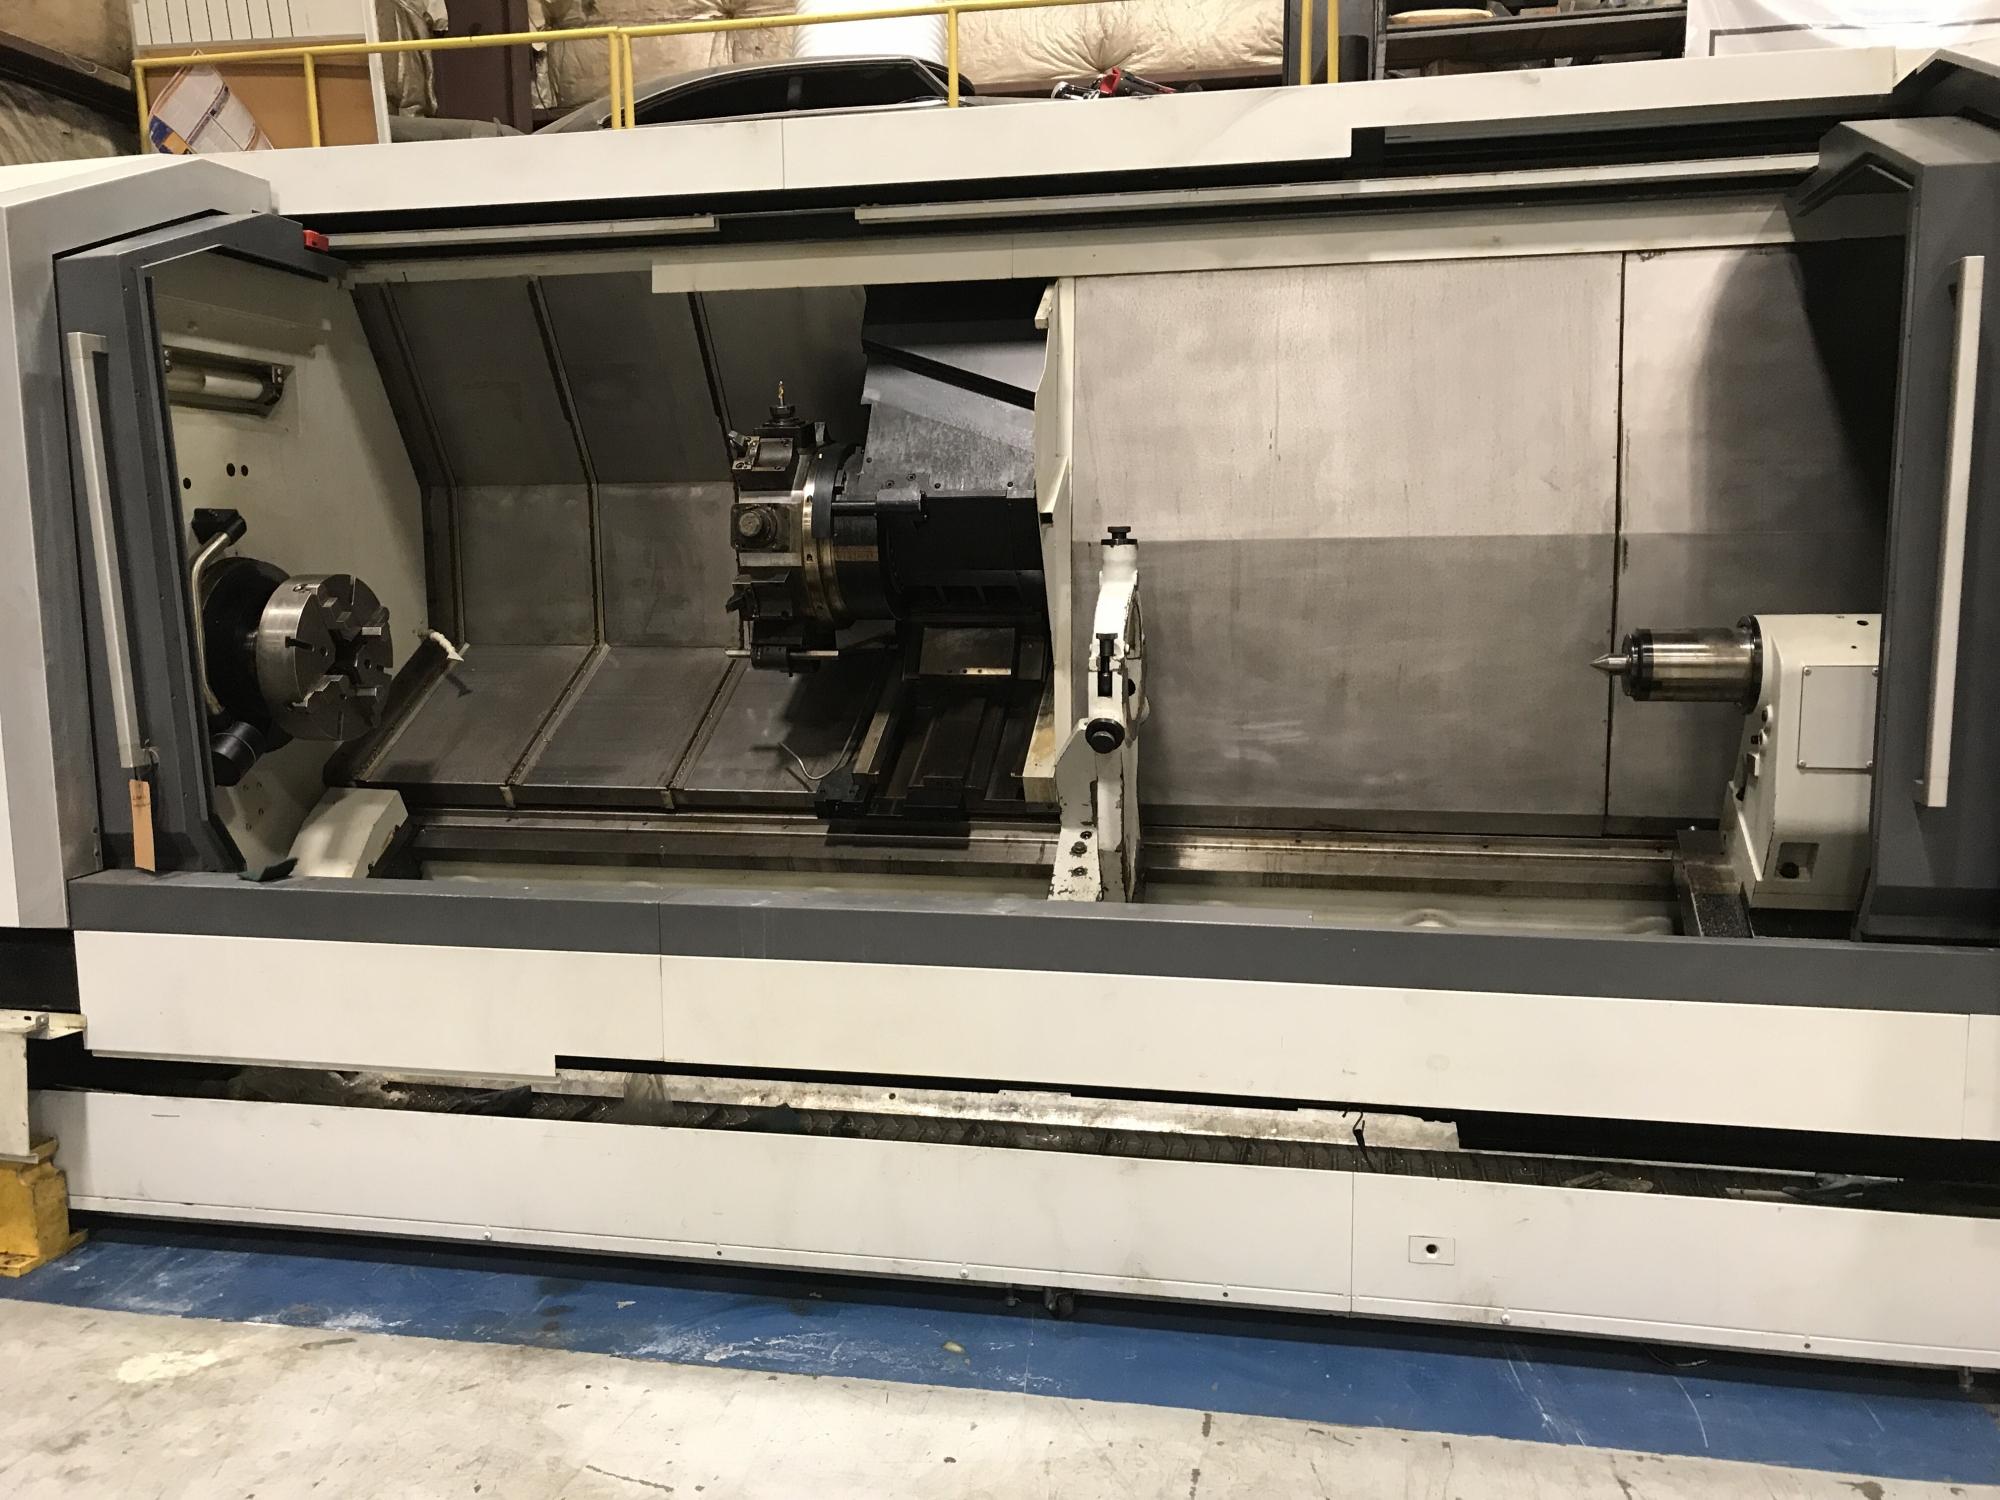 2012 MORI SEIKI NL3000Y/3000 - CNC Horizontal Lathe